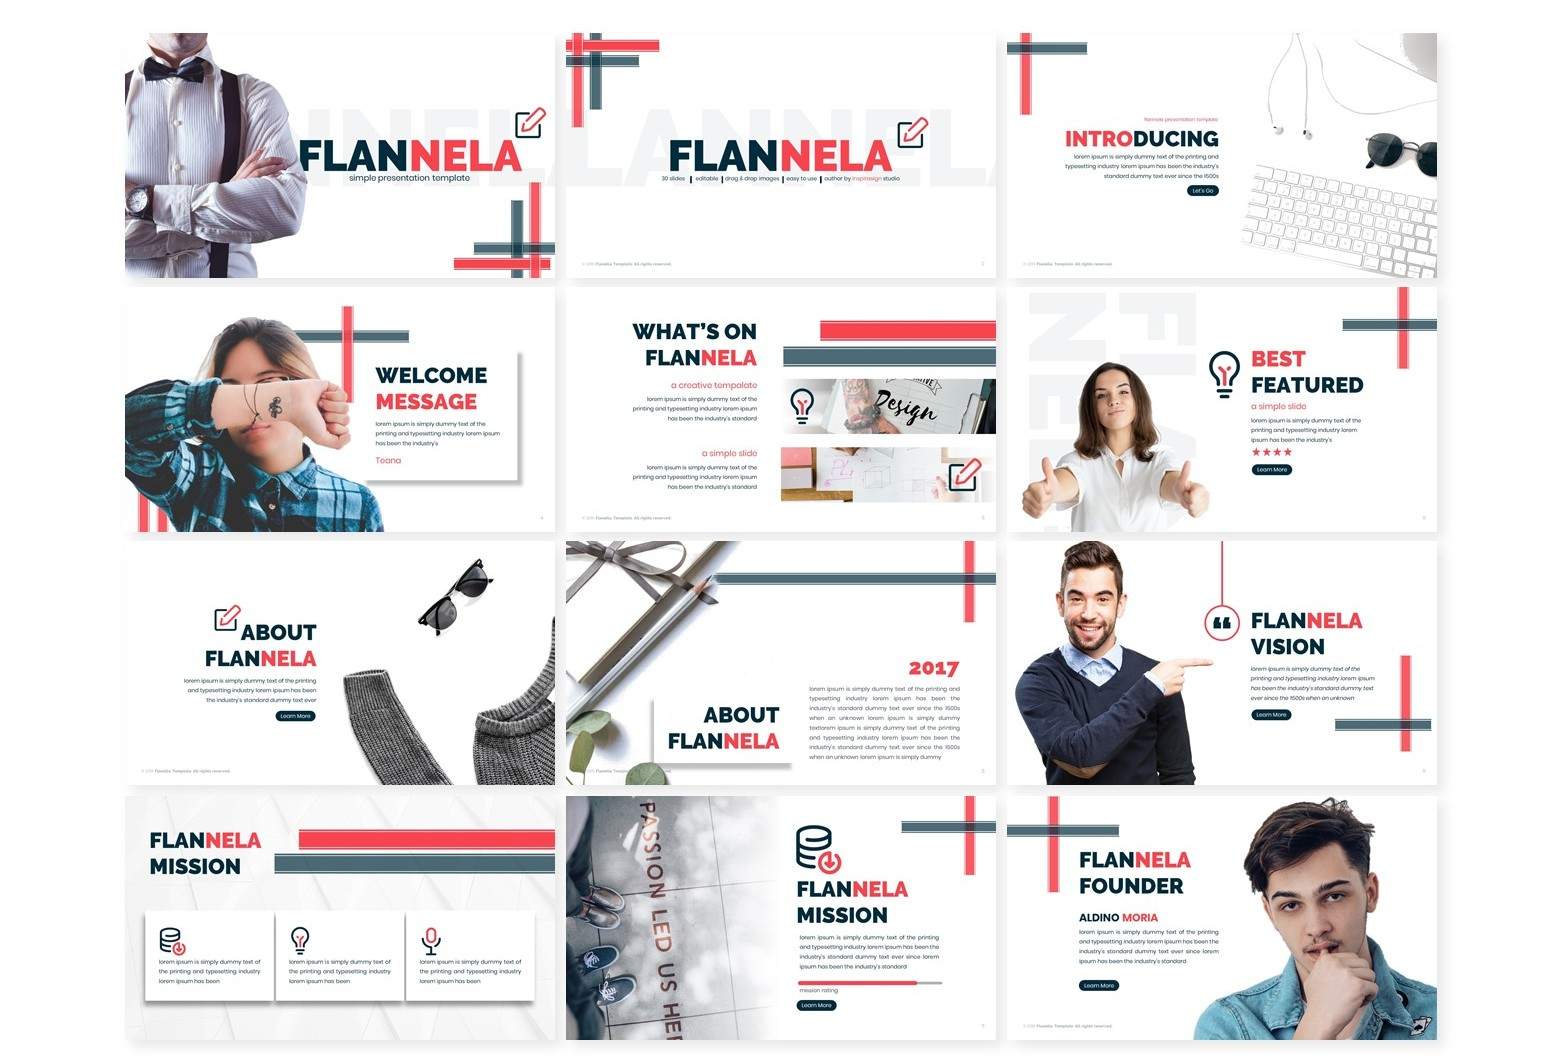 Flannela Power Point Template - Slide1 47 -